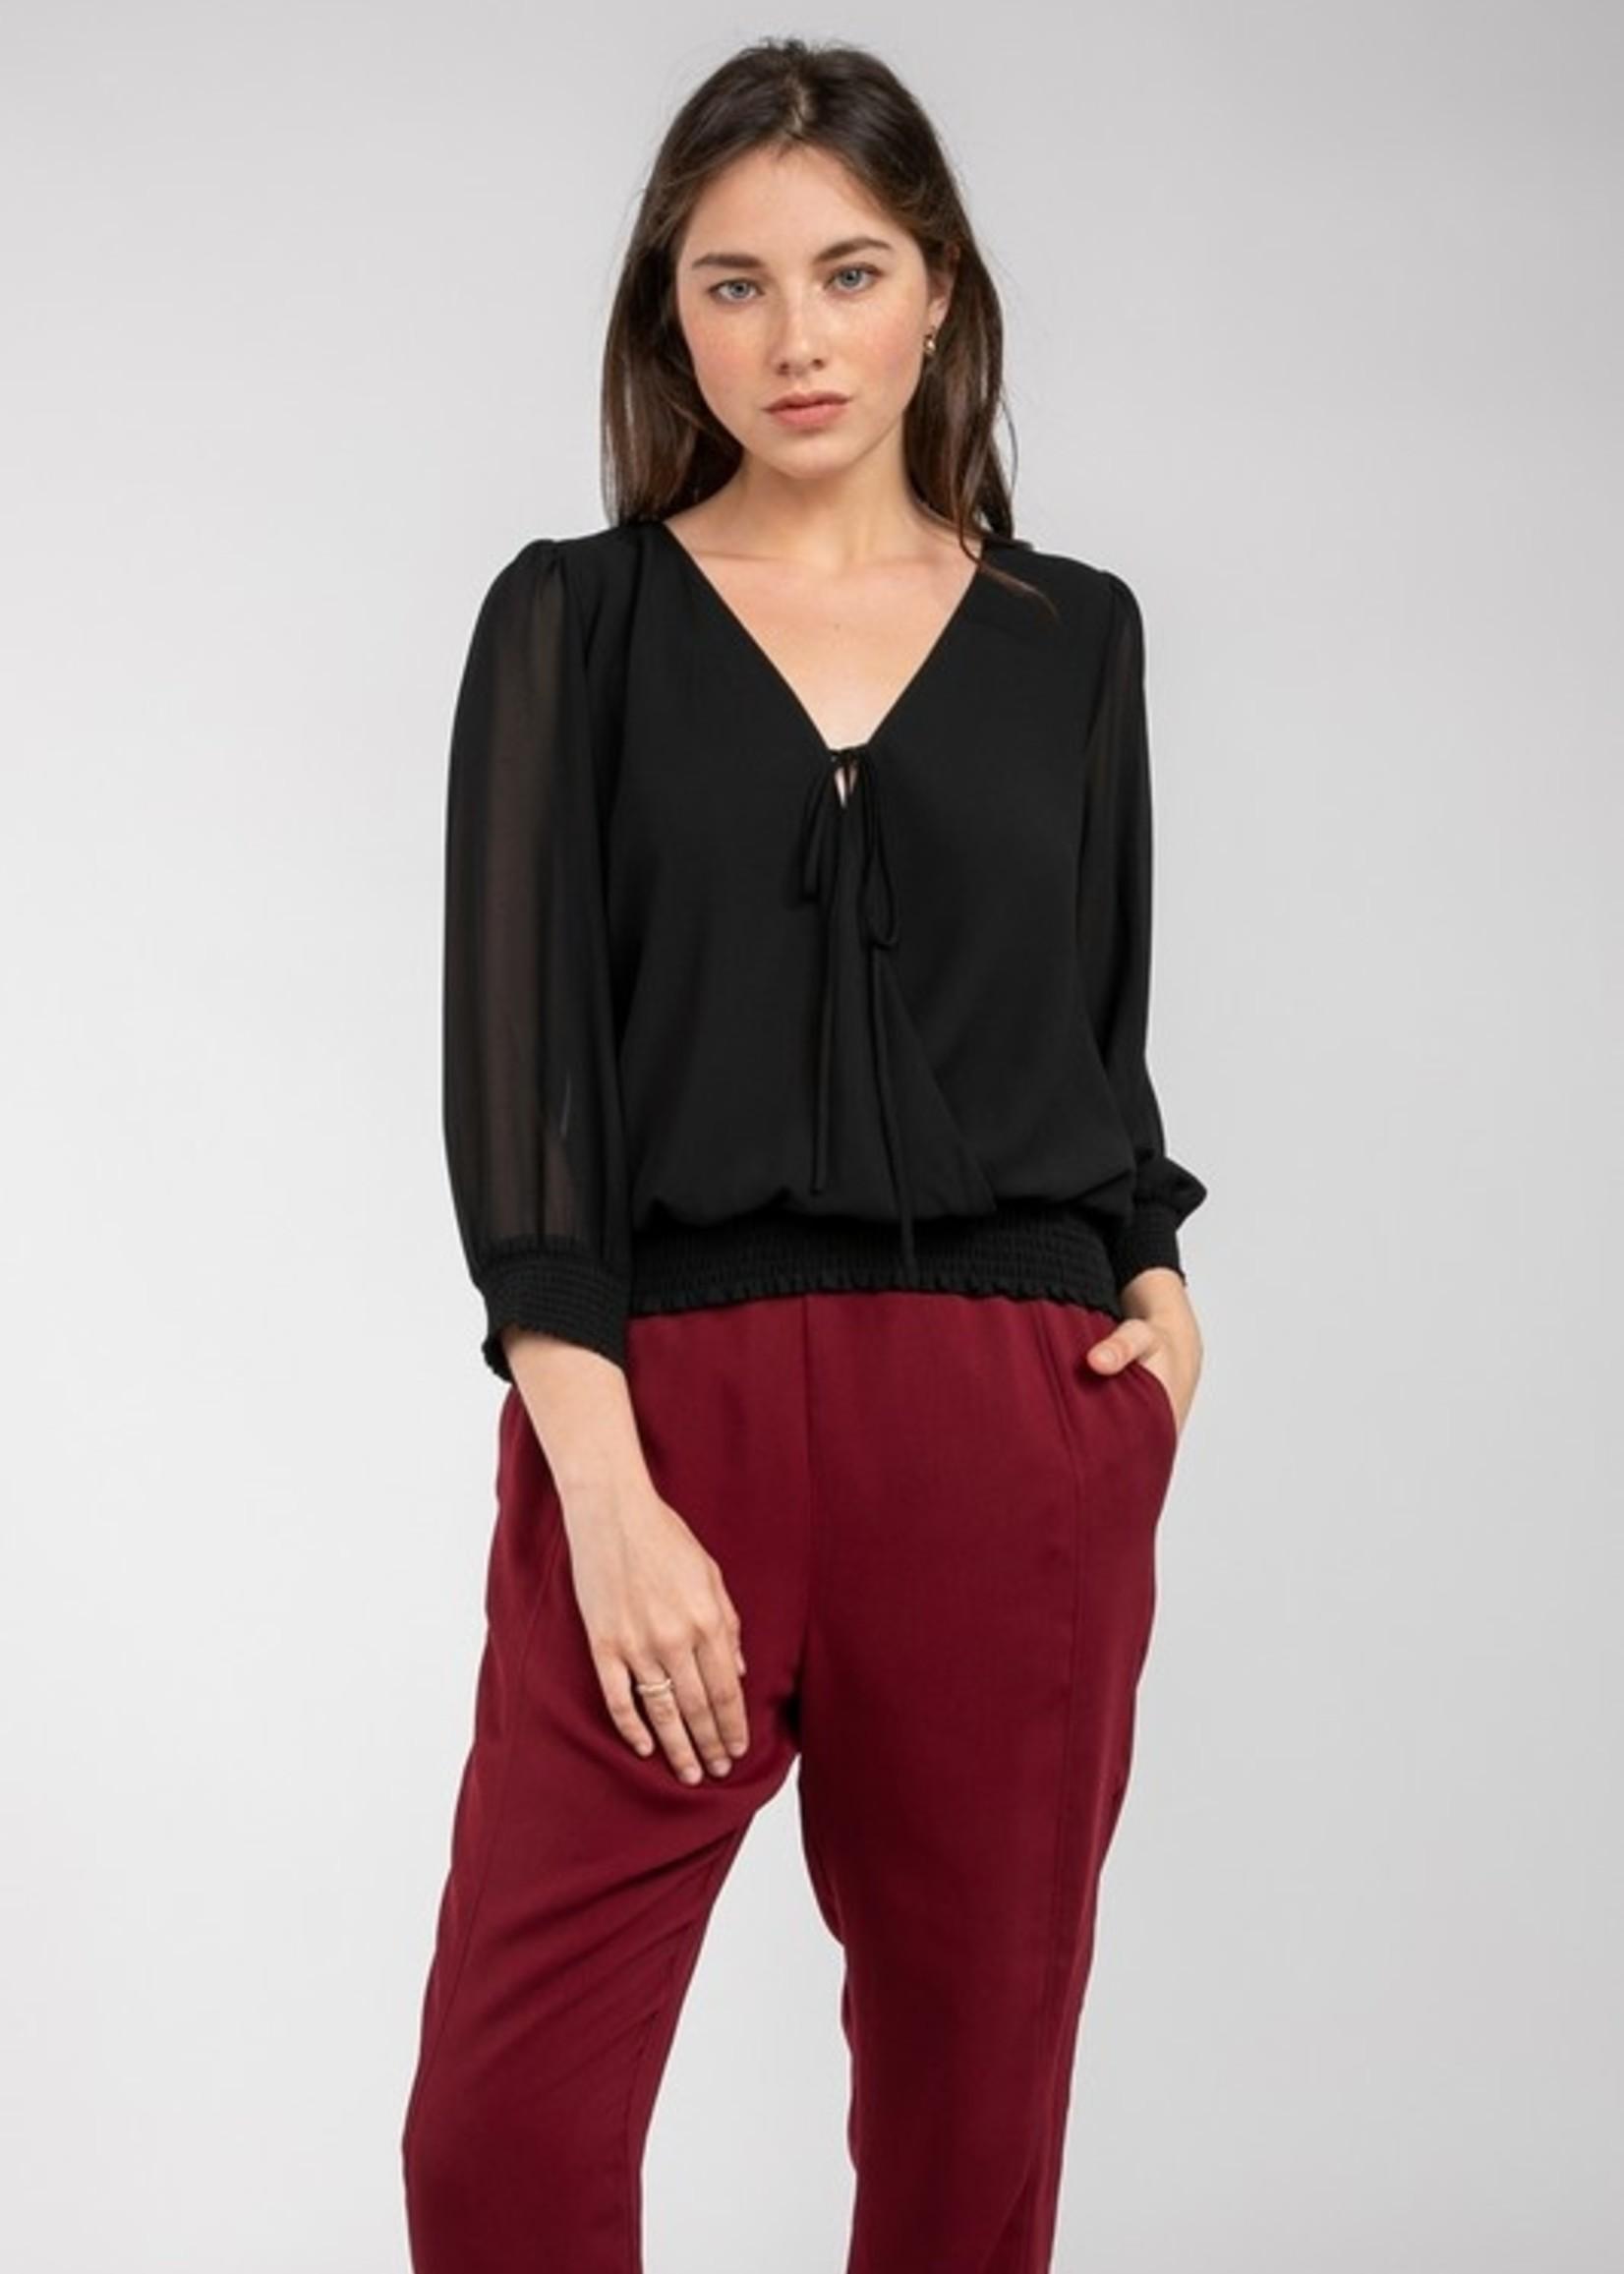 Banded bottom blouse